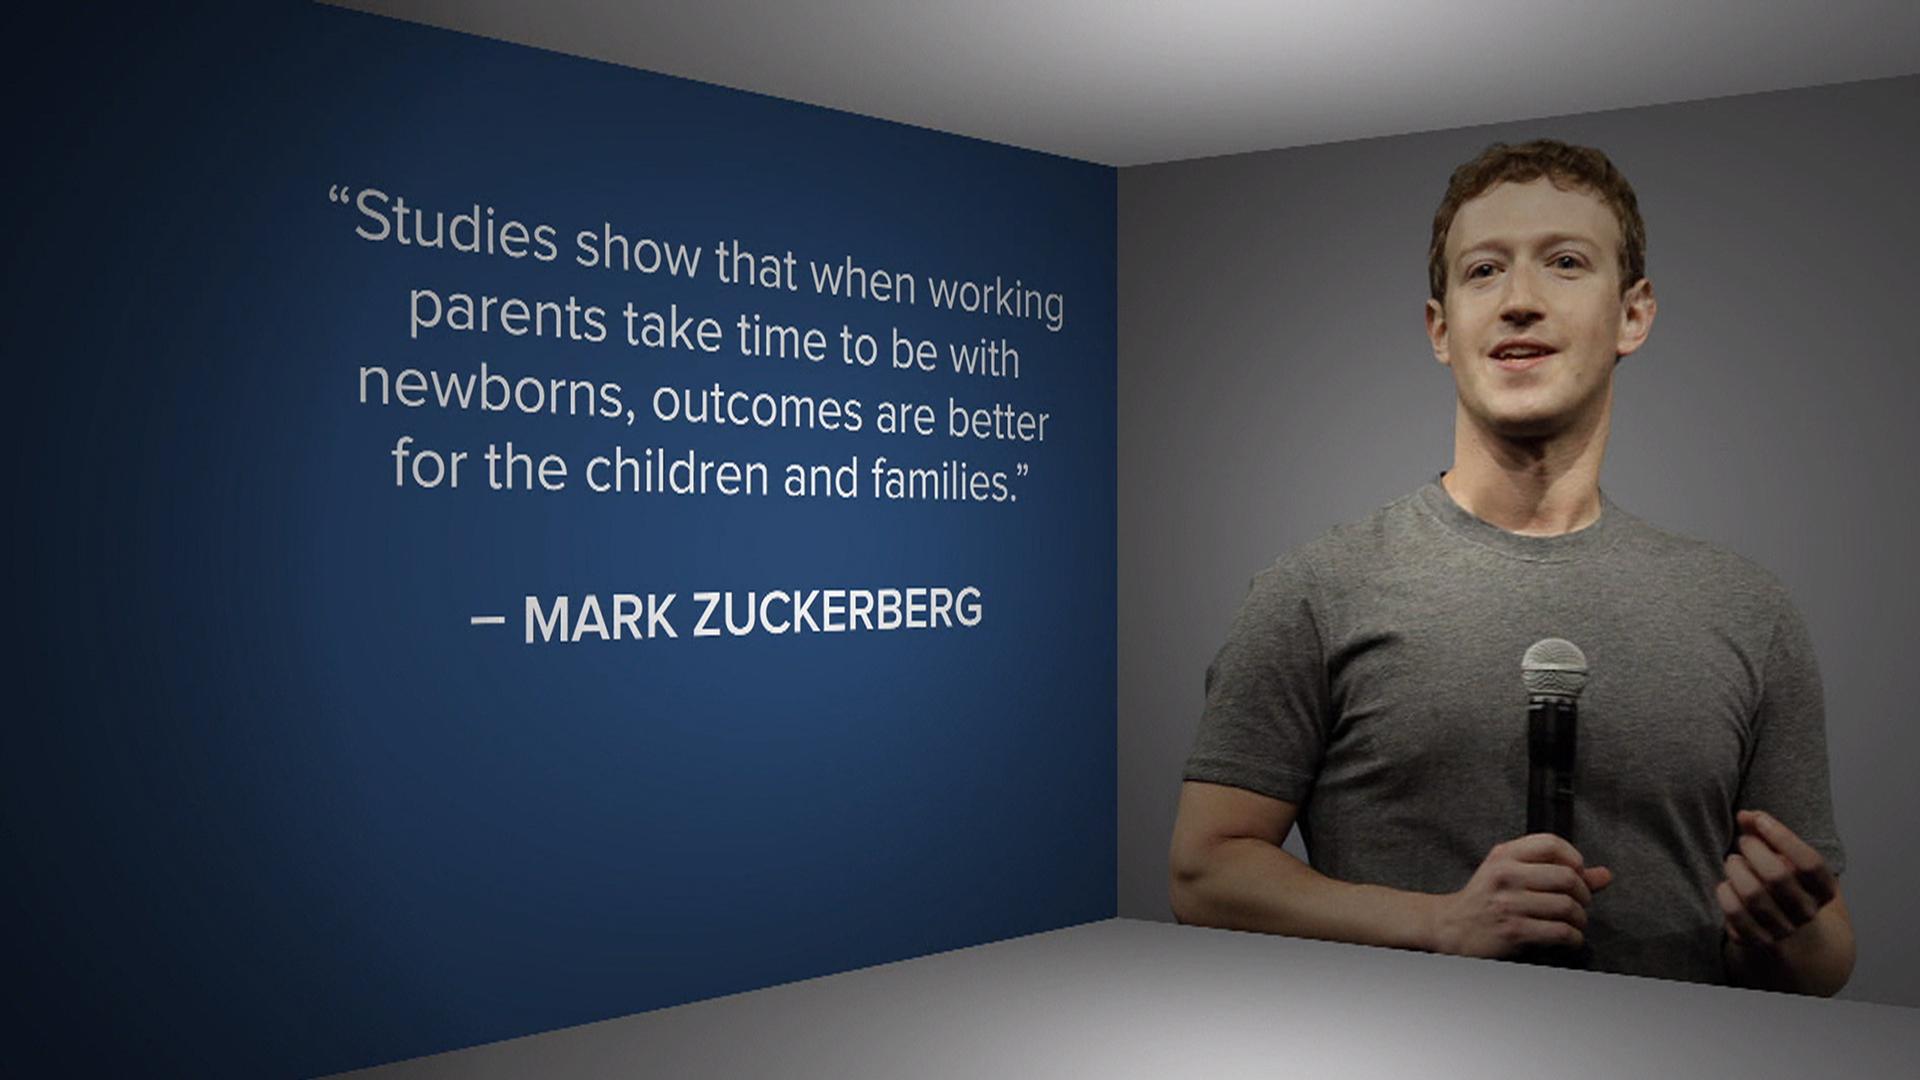 Mark Zuckerberg Quotes Hd Wallpaper Mark Zuckerberg Wallpapers